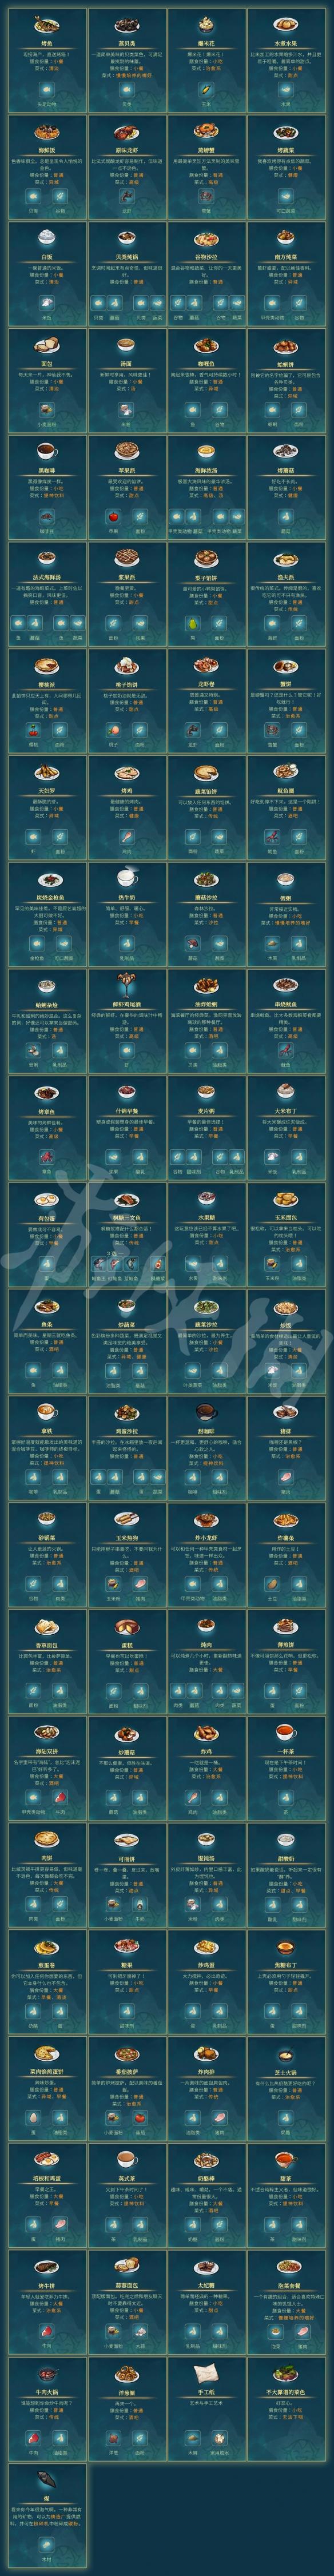 《Spiritfarer》食物怎么制作?全菜谱一览